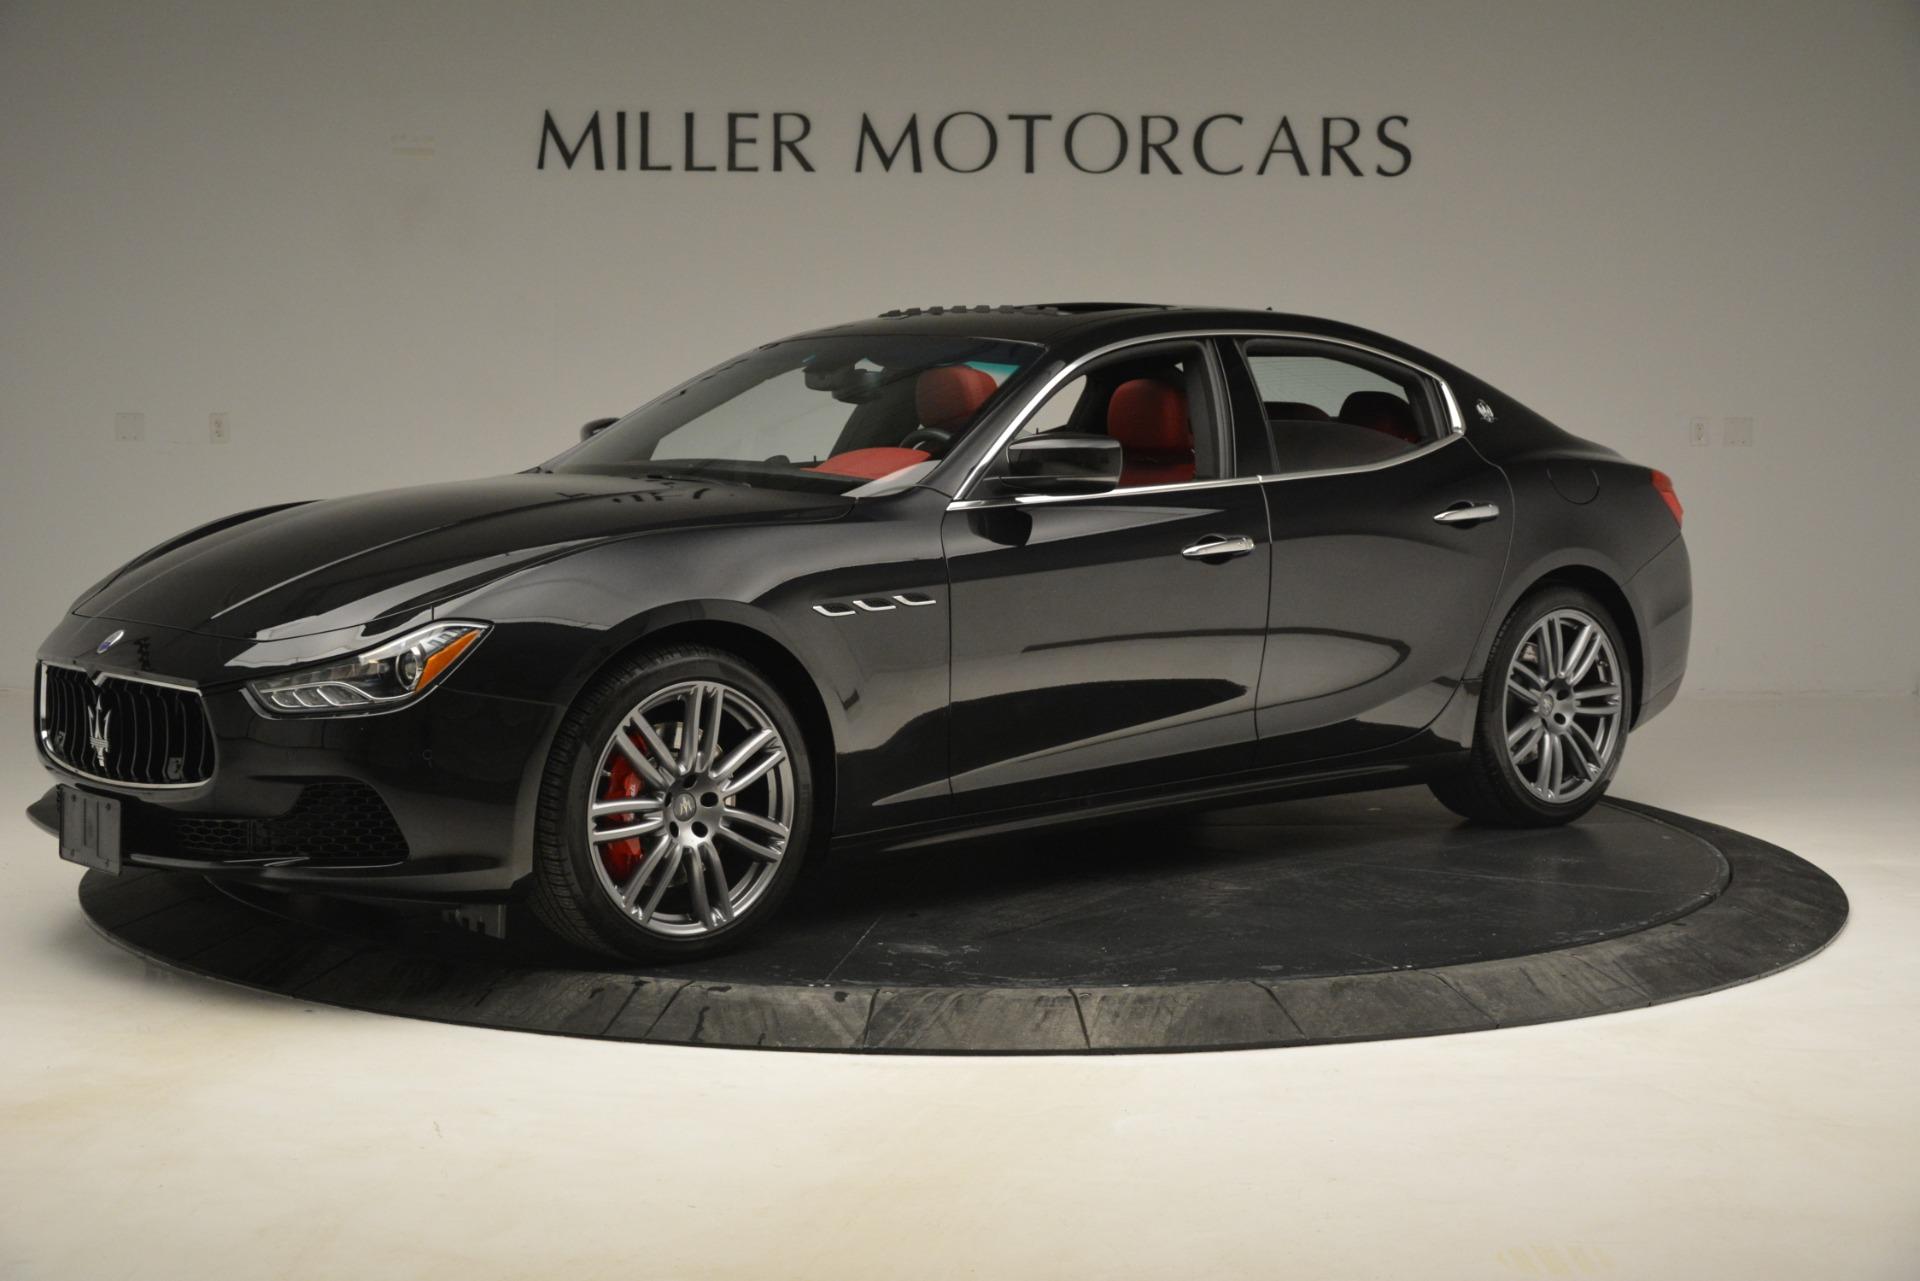 Used 2016 Maserati Ghibli S Q4 For Sale In Greenwich, CT 2945_p2